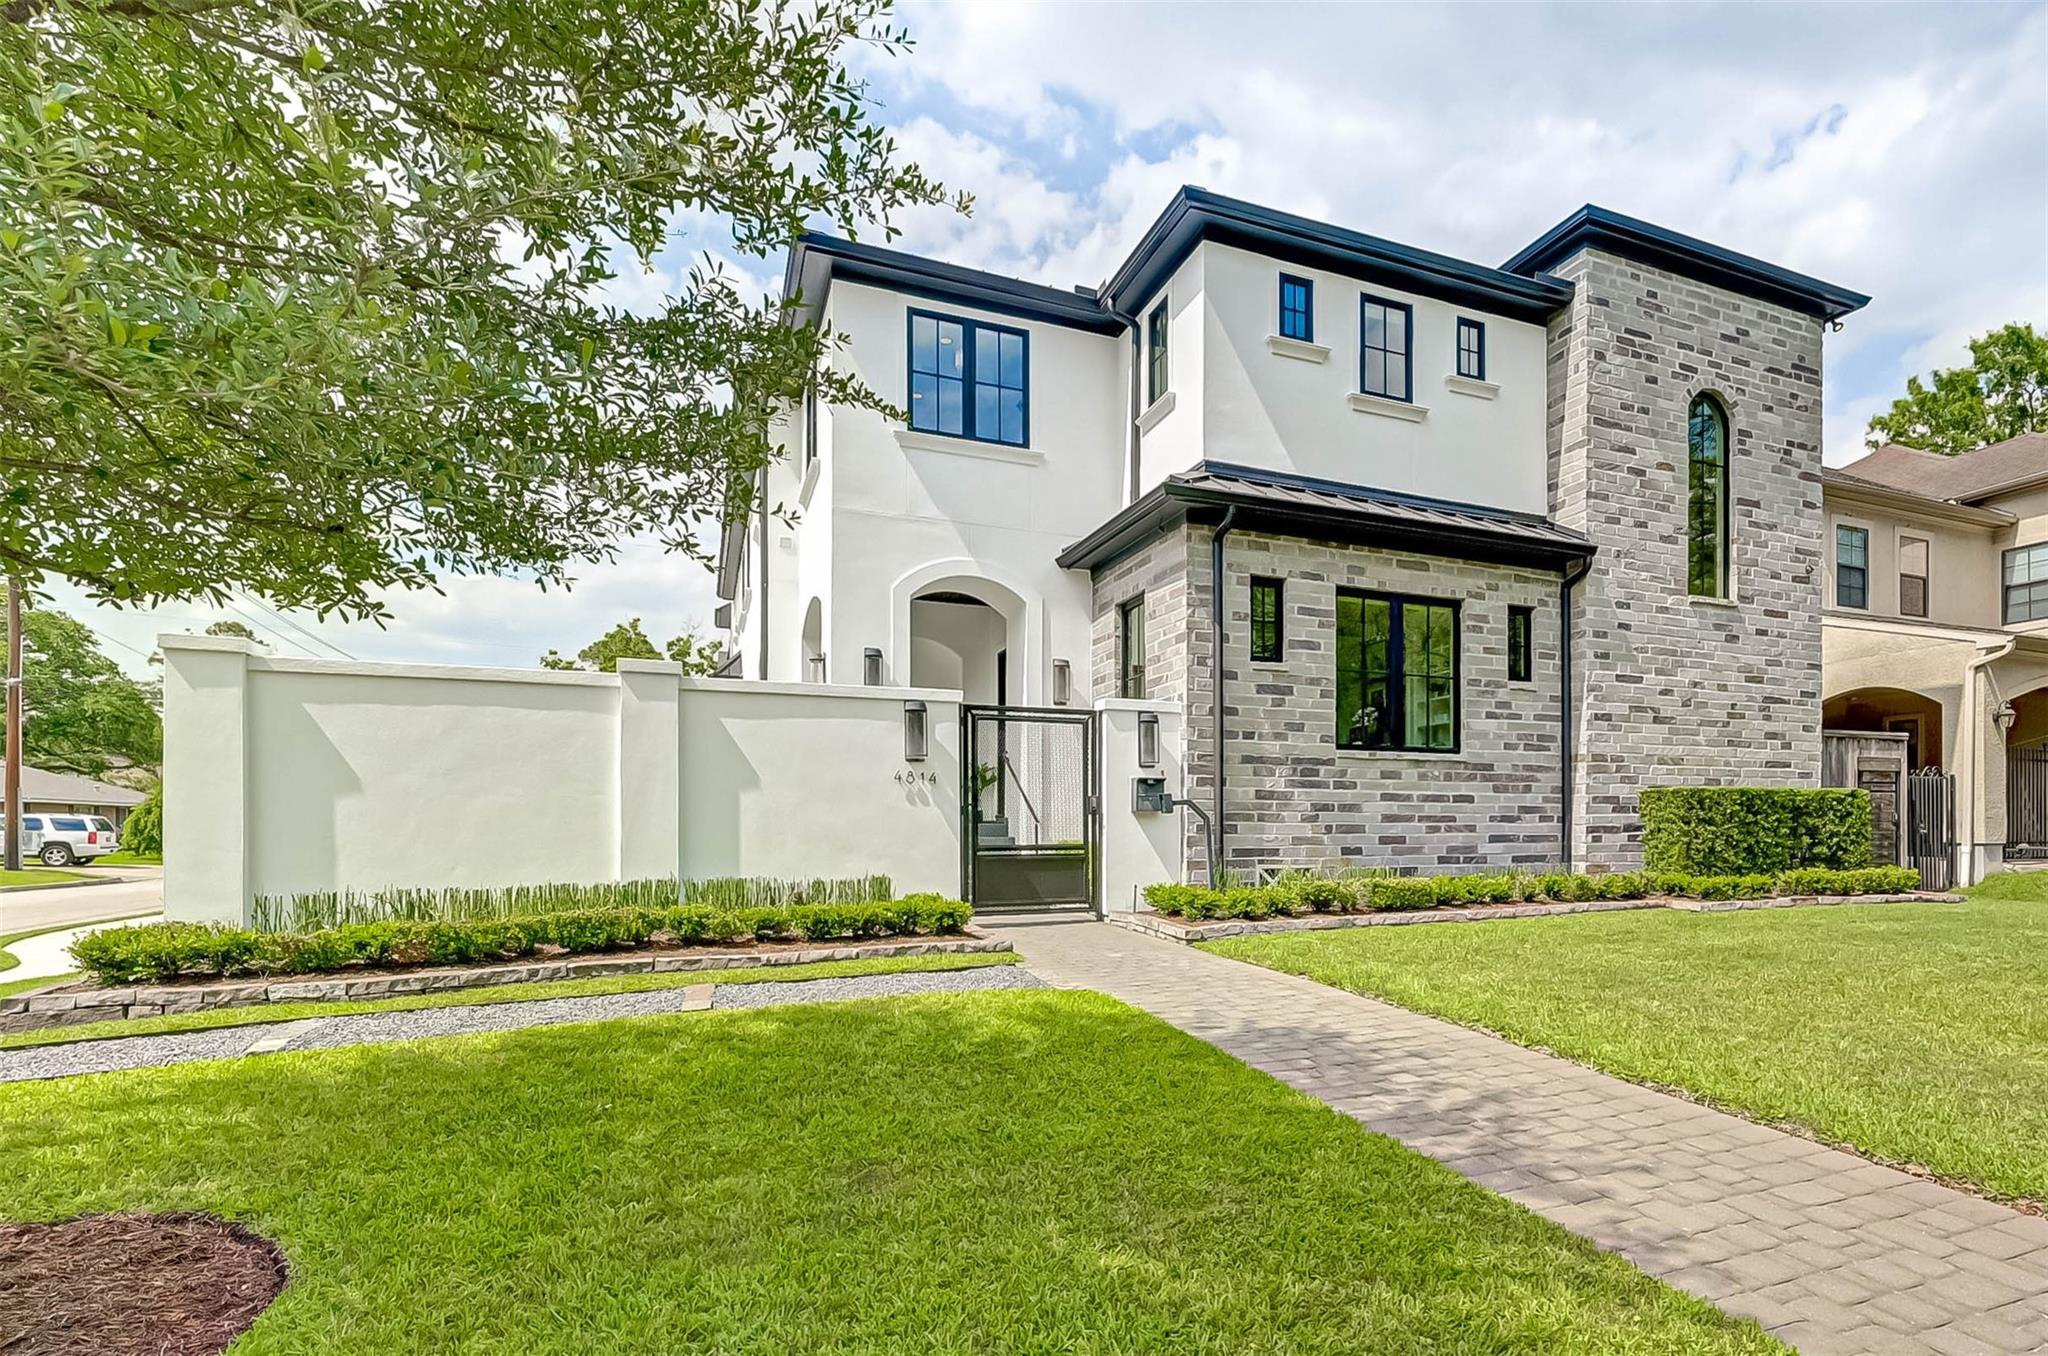 4814 Holly Street Property Photo